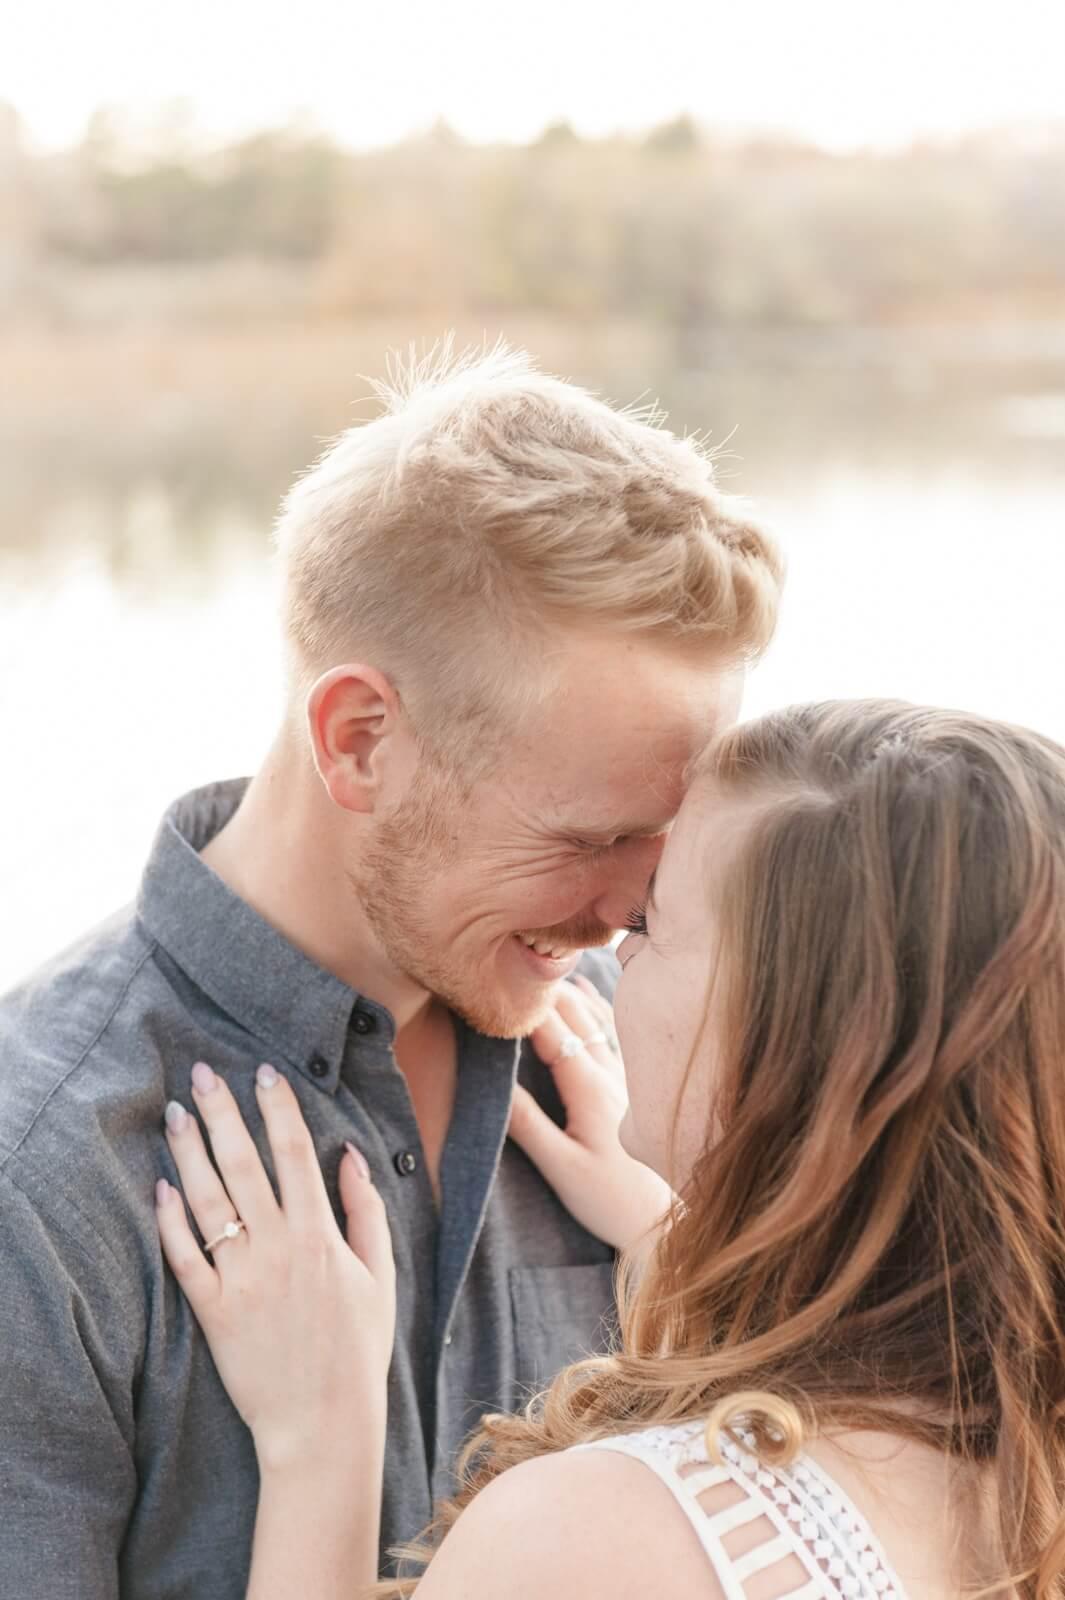 Regina Engagement Photographer - Evan-Chantel - Laughing by the lake